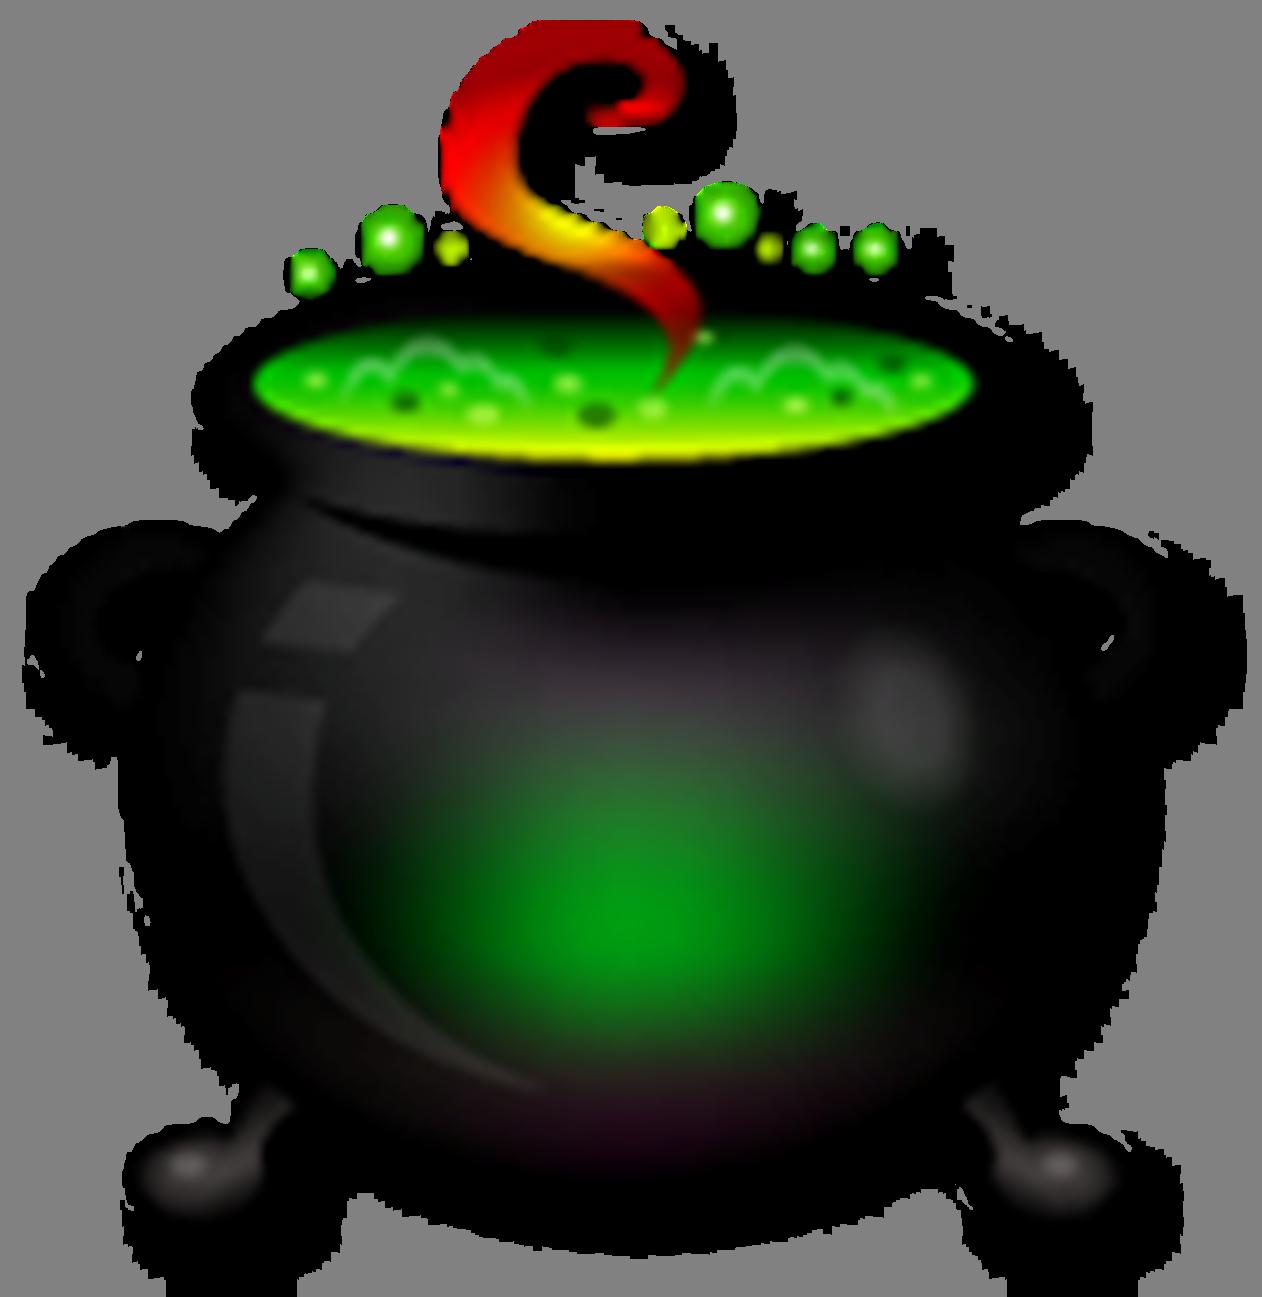 free halloween clipart witch cauldron - photo #8